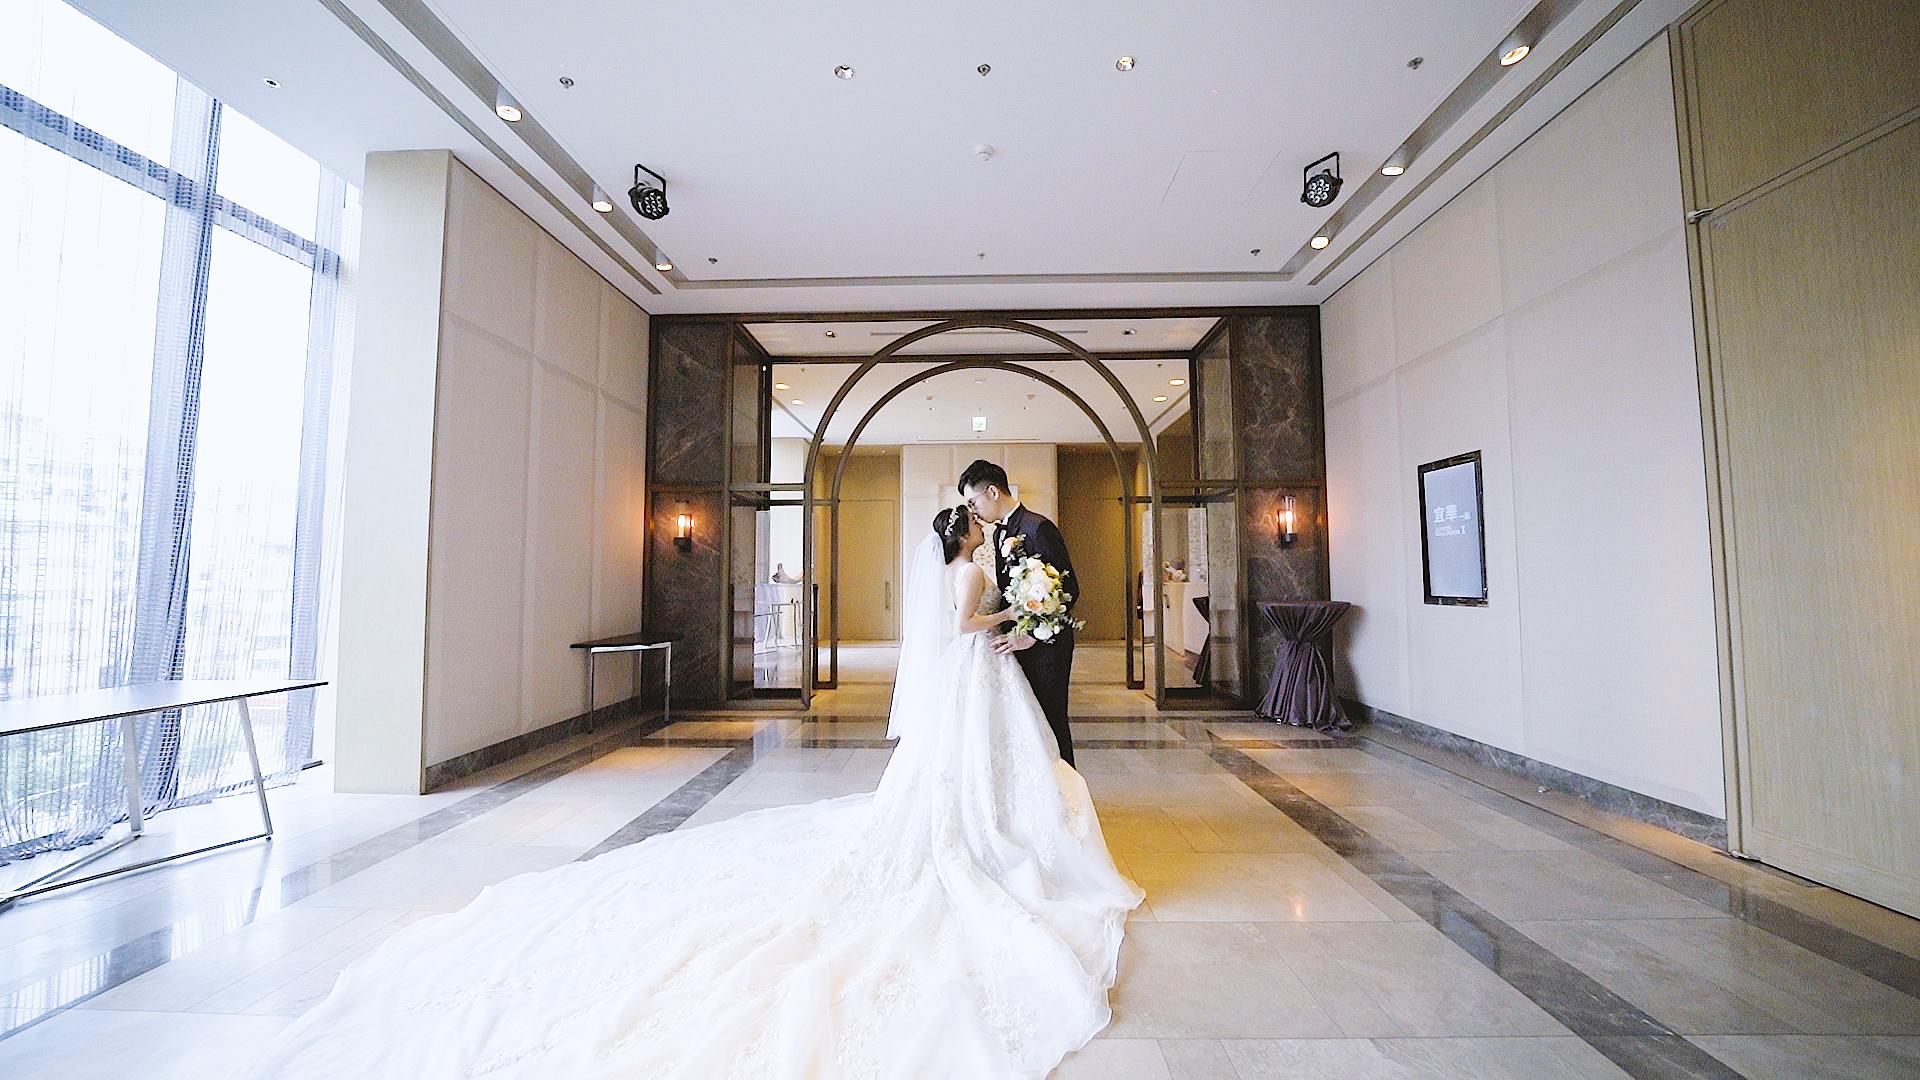 Jason & Wendy Wedding Mv 萬豪酒店.00_04_10_20.Still001